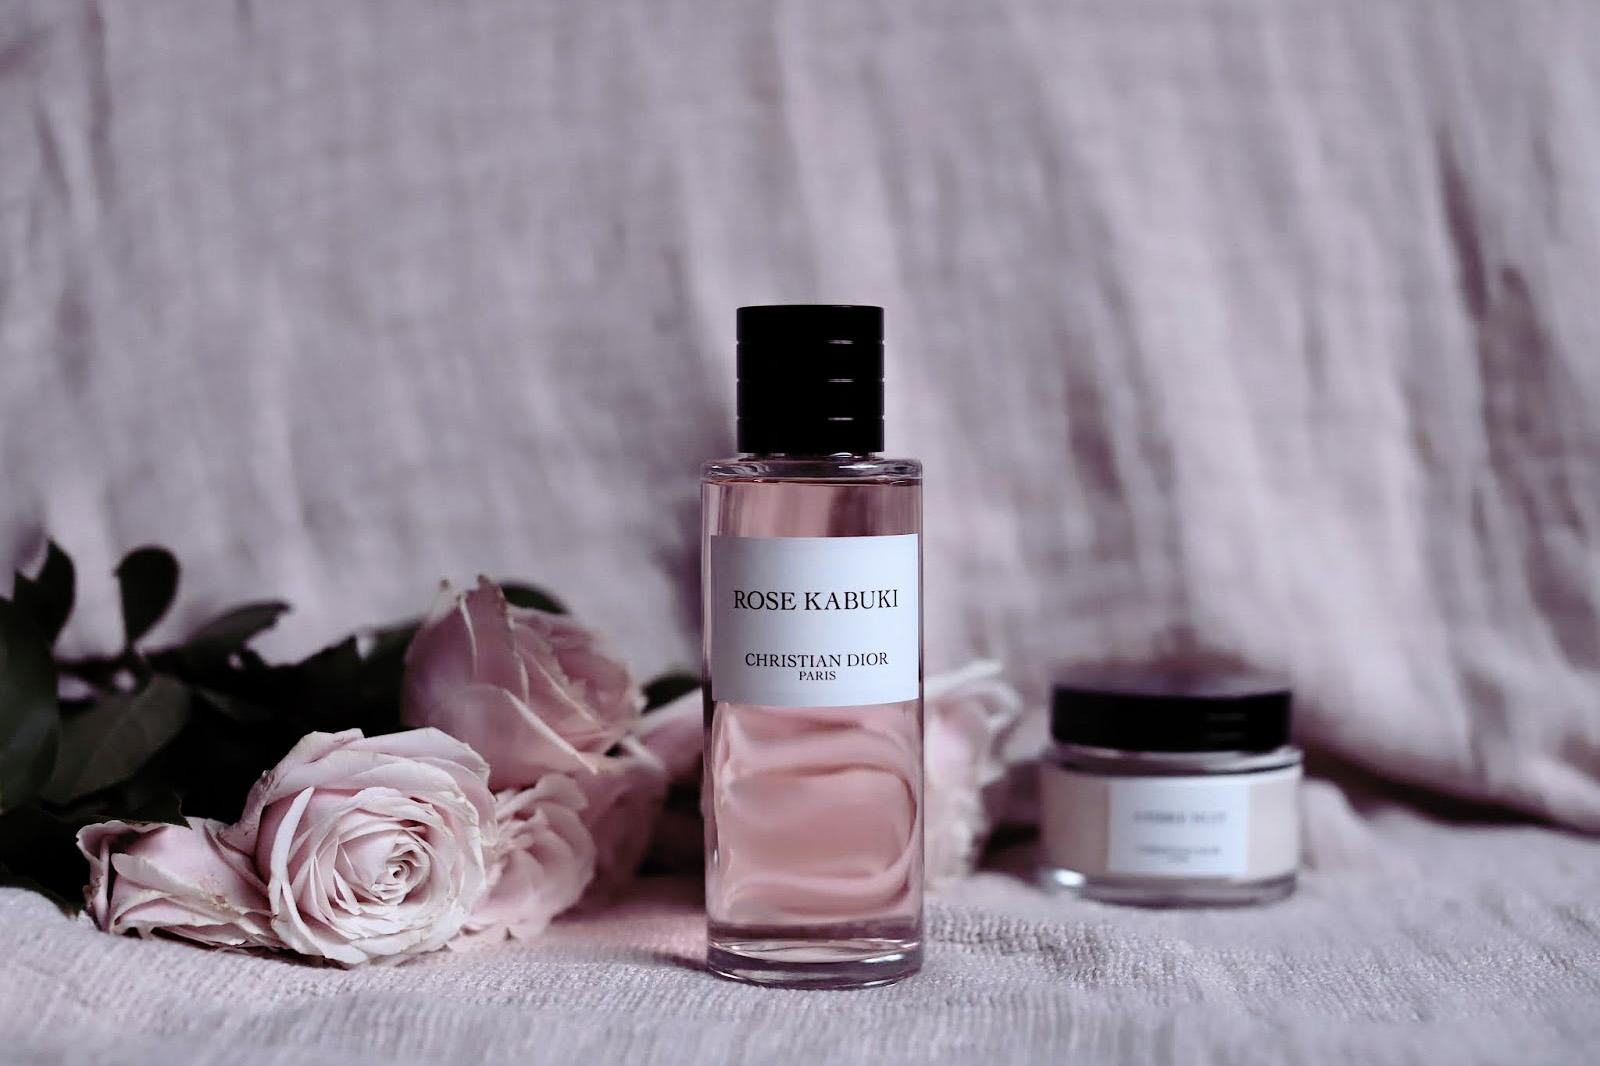 eeac656edd Maison Christian Dior : Rose Kabuki ! | kleo beauté